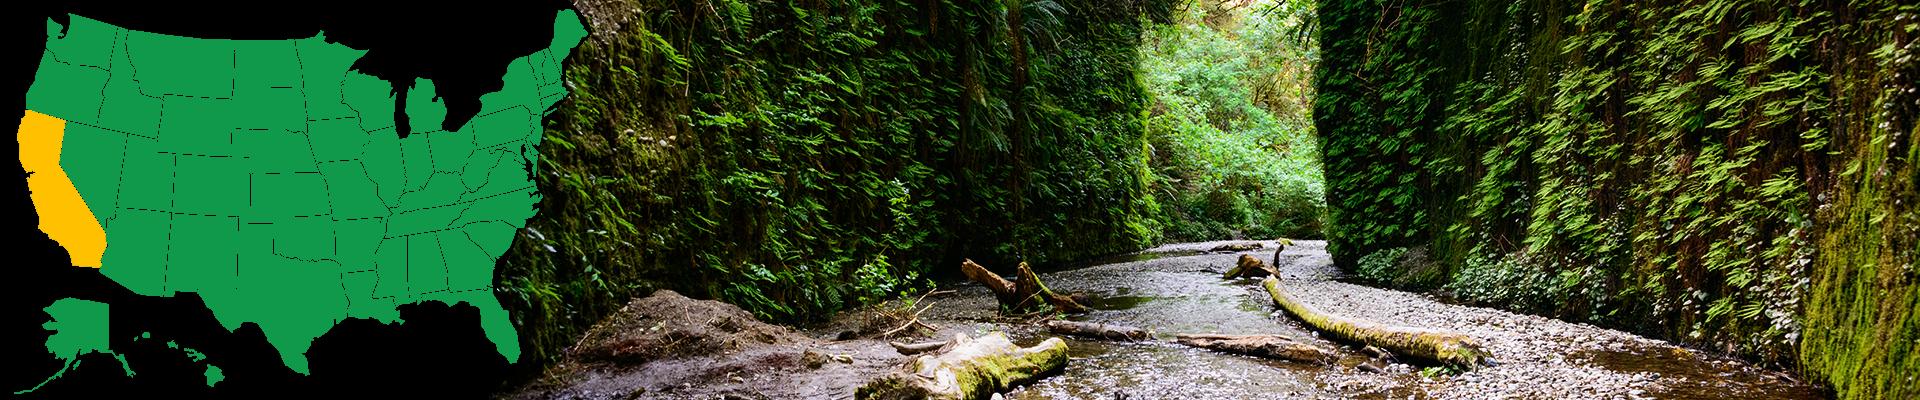 Redwood National Park in California